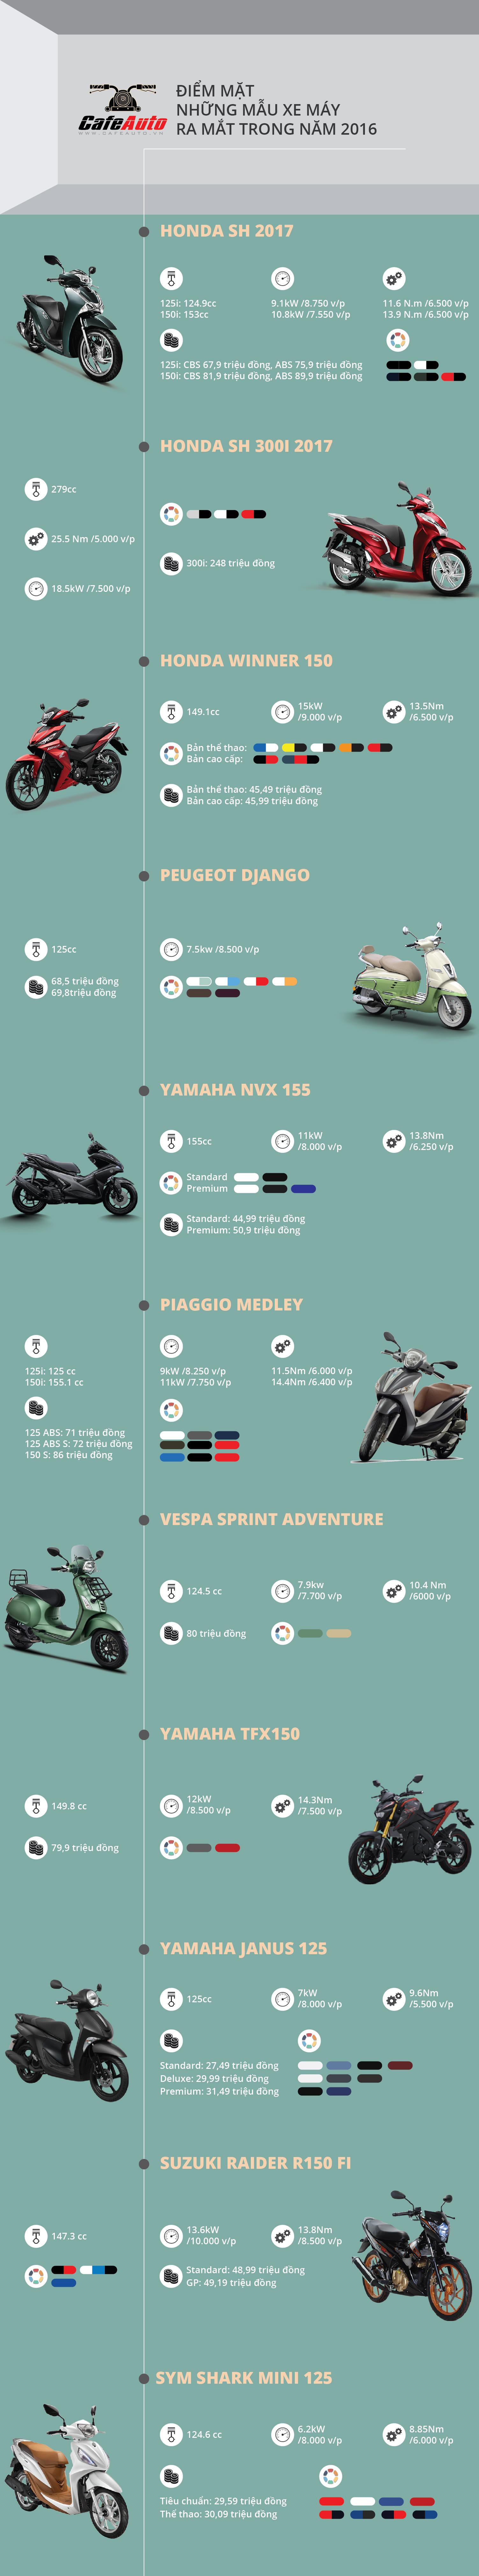 infographic-diem-mat-nhung-mau-xe-may-ra-mat-trong-nam-2016